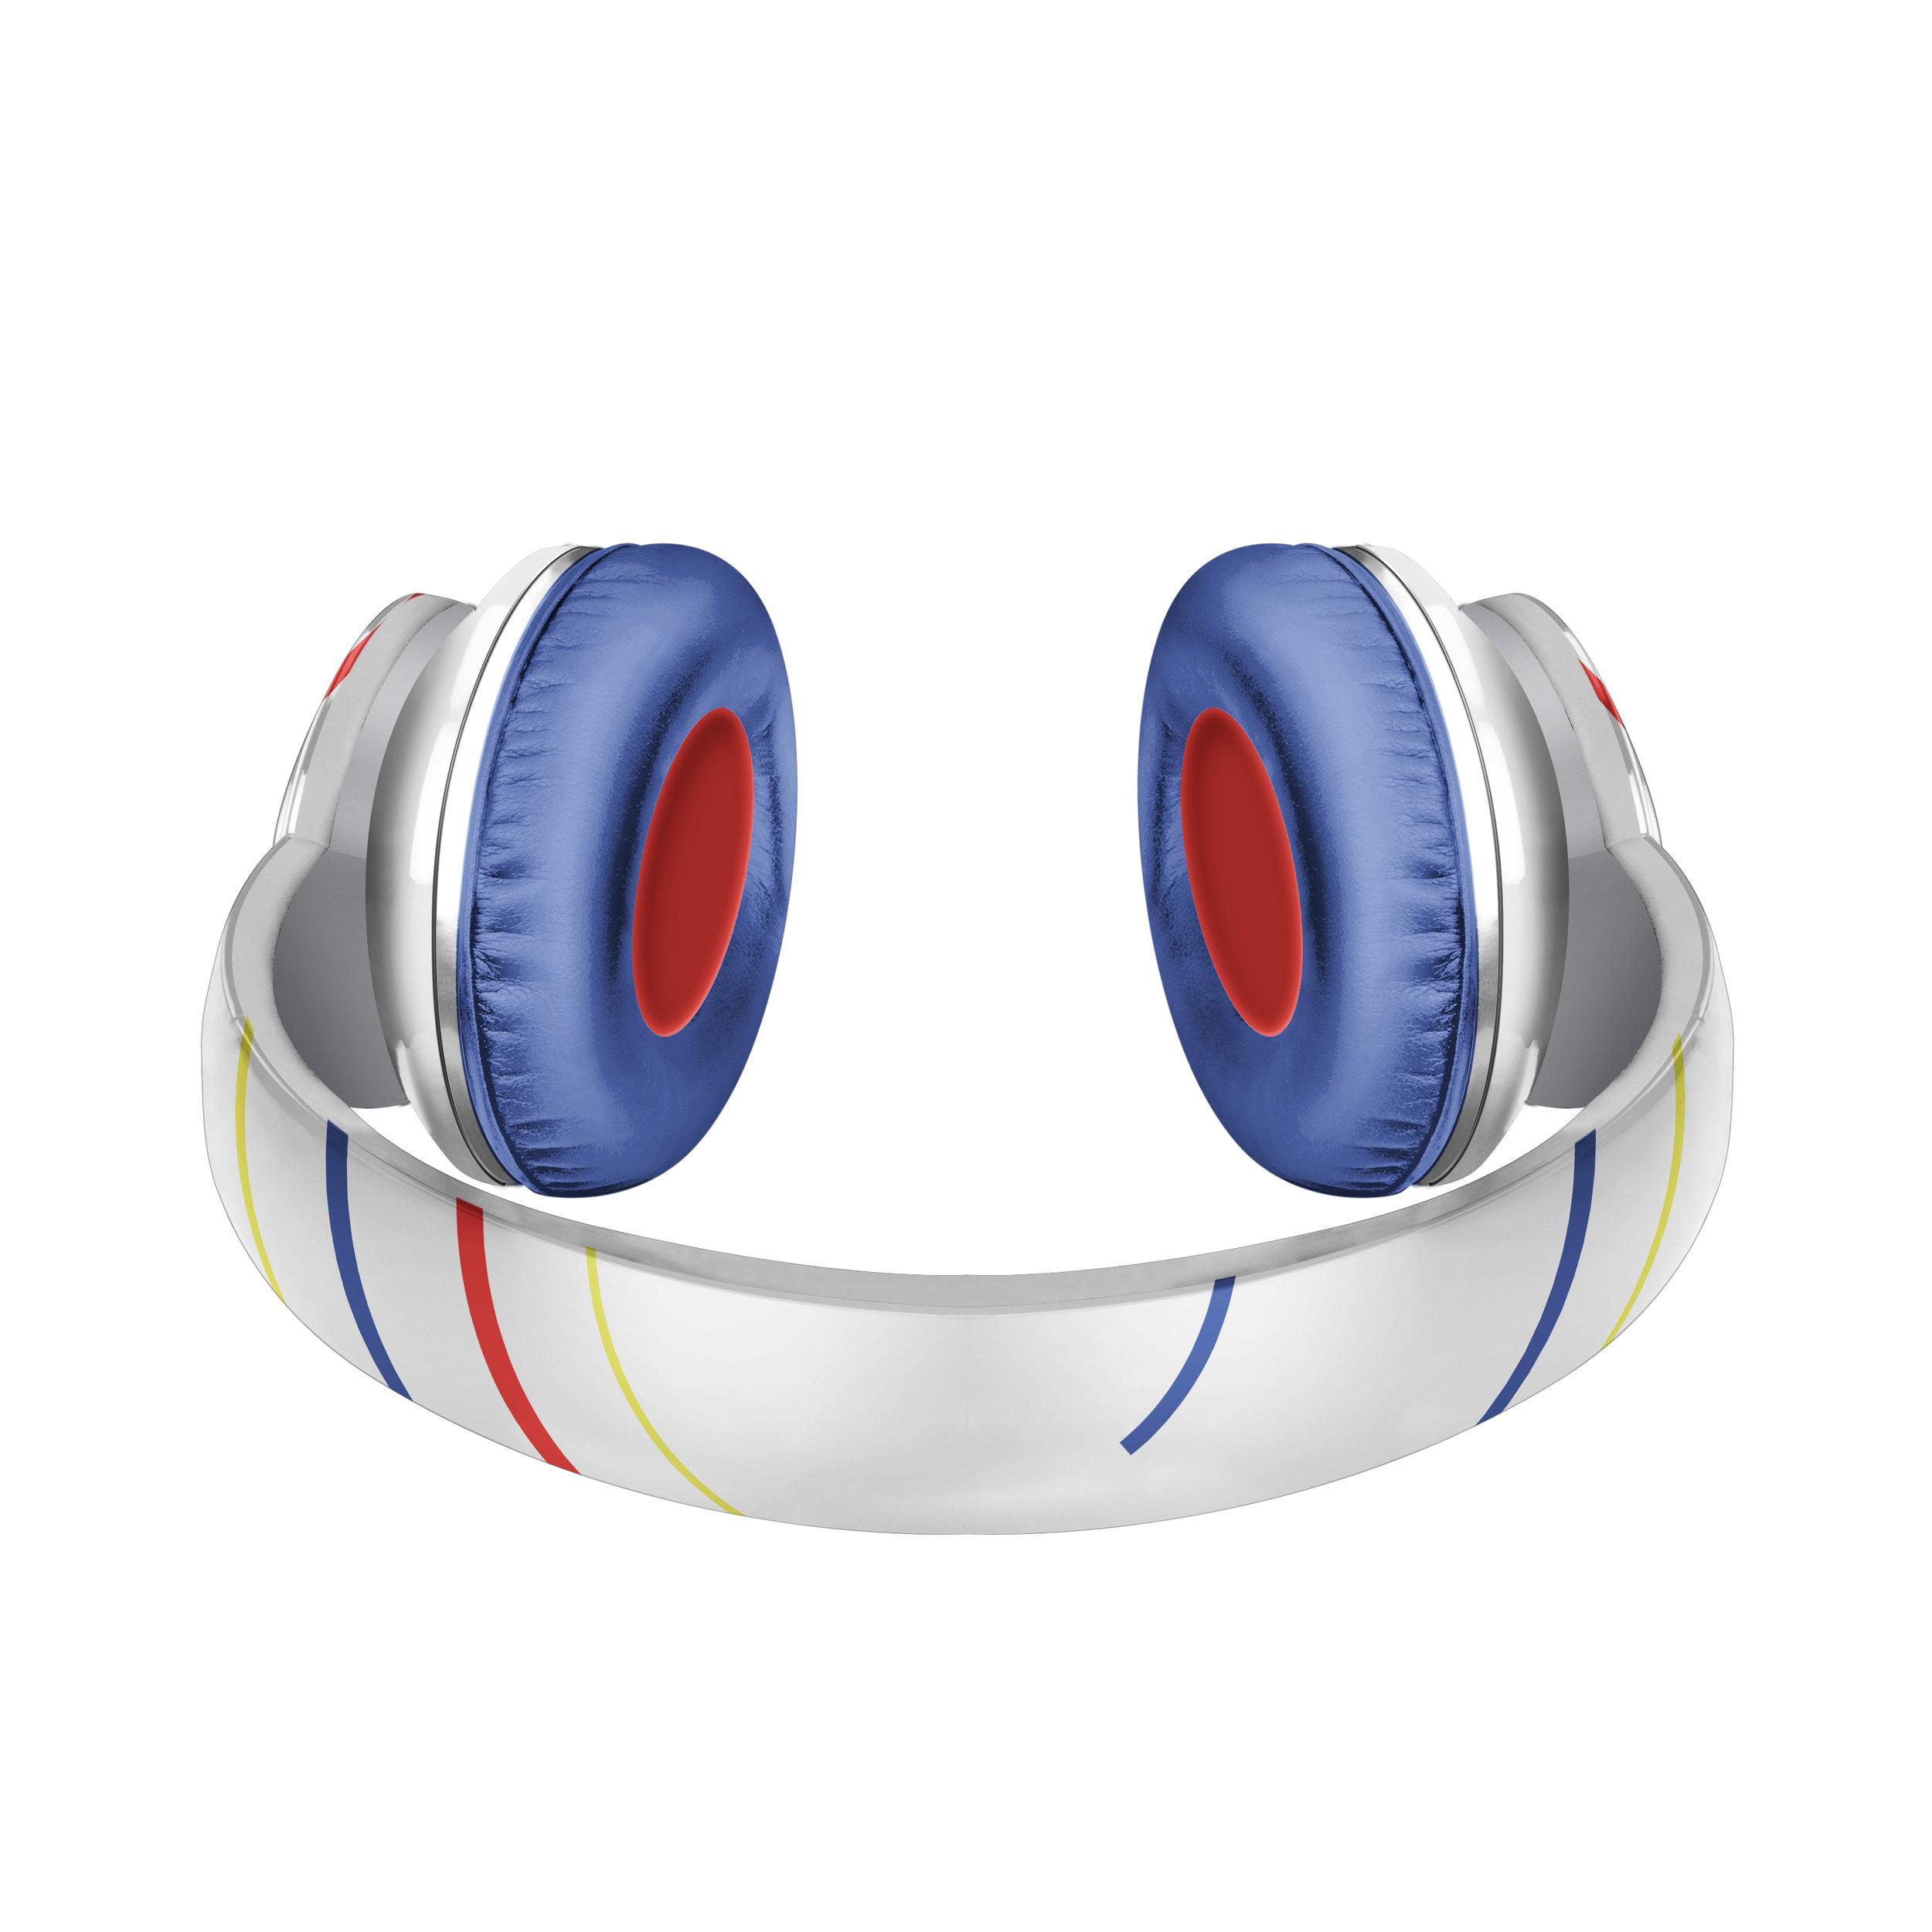 Spin Records_Headphones 2.jpg